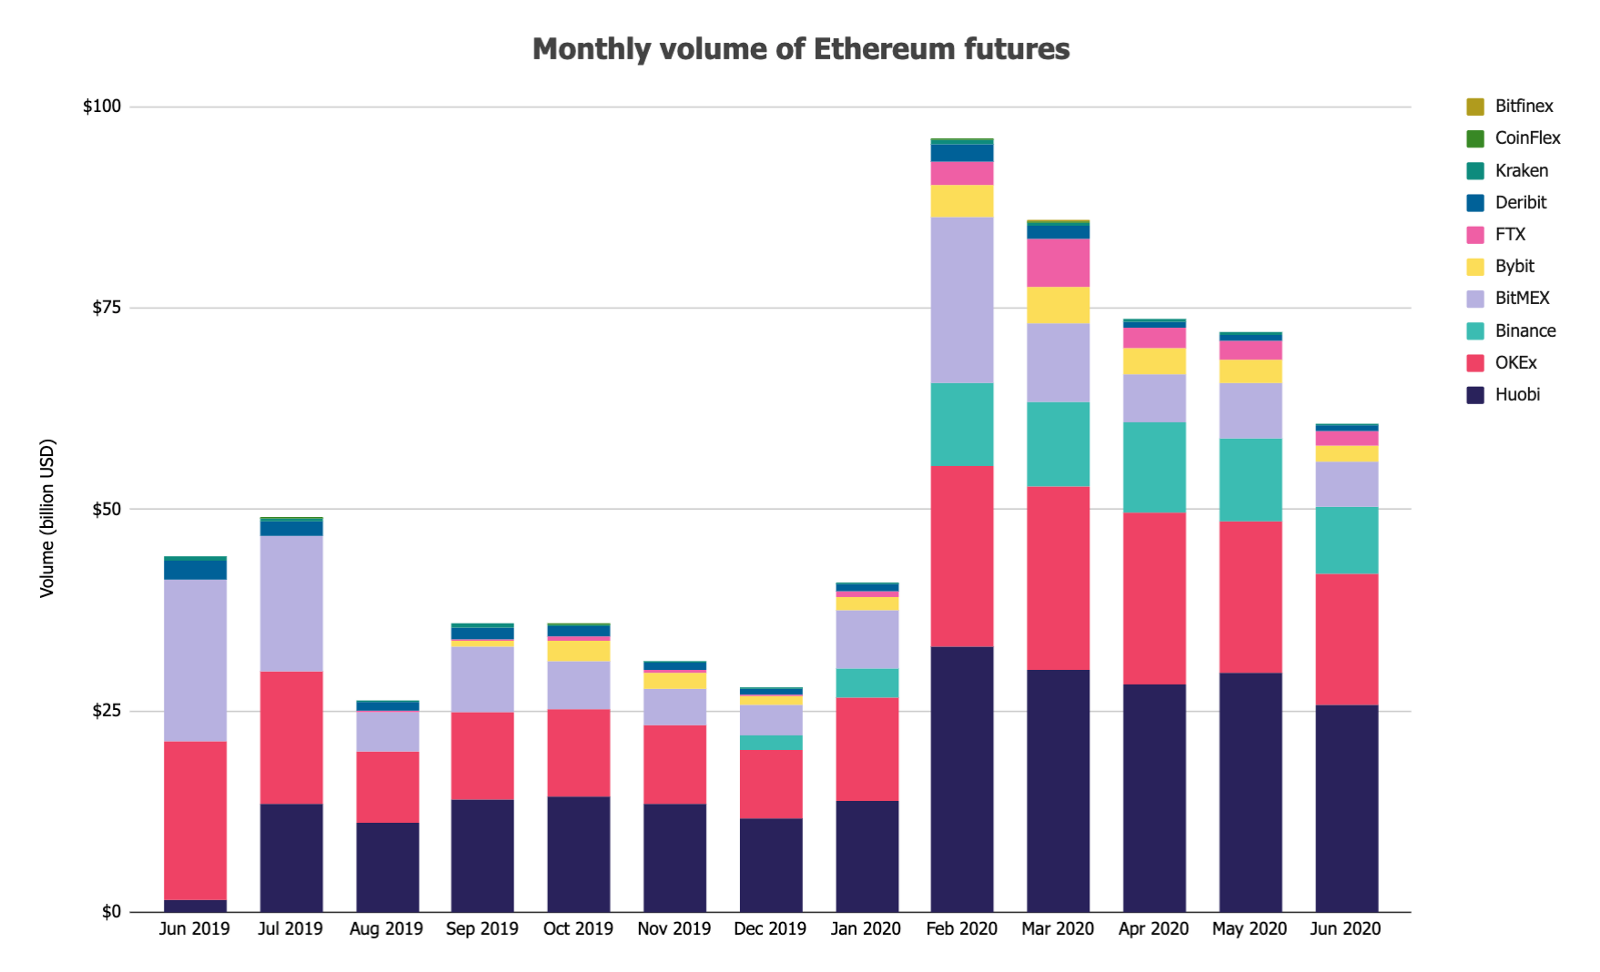 Monthly volume of ethereum futures